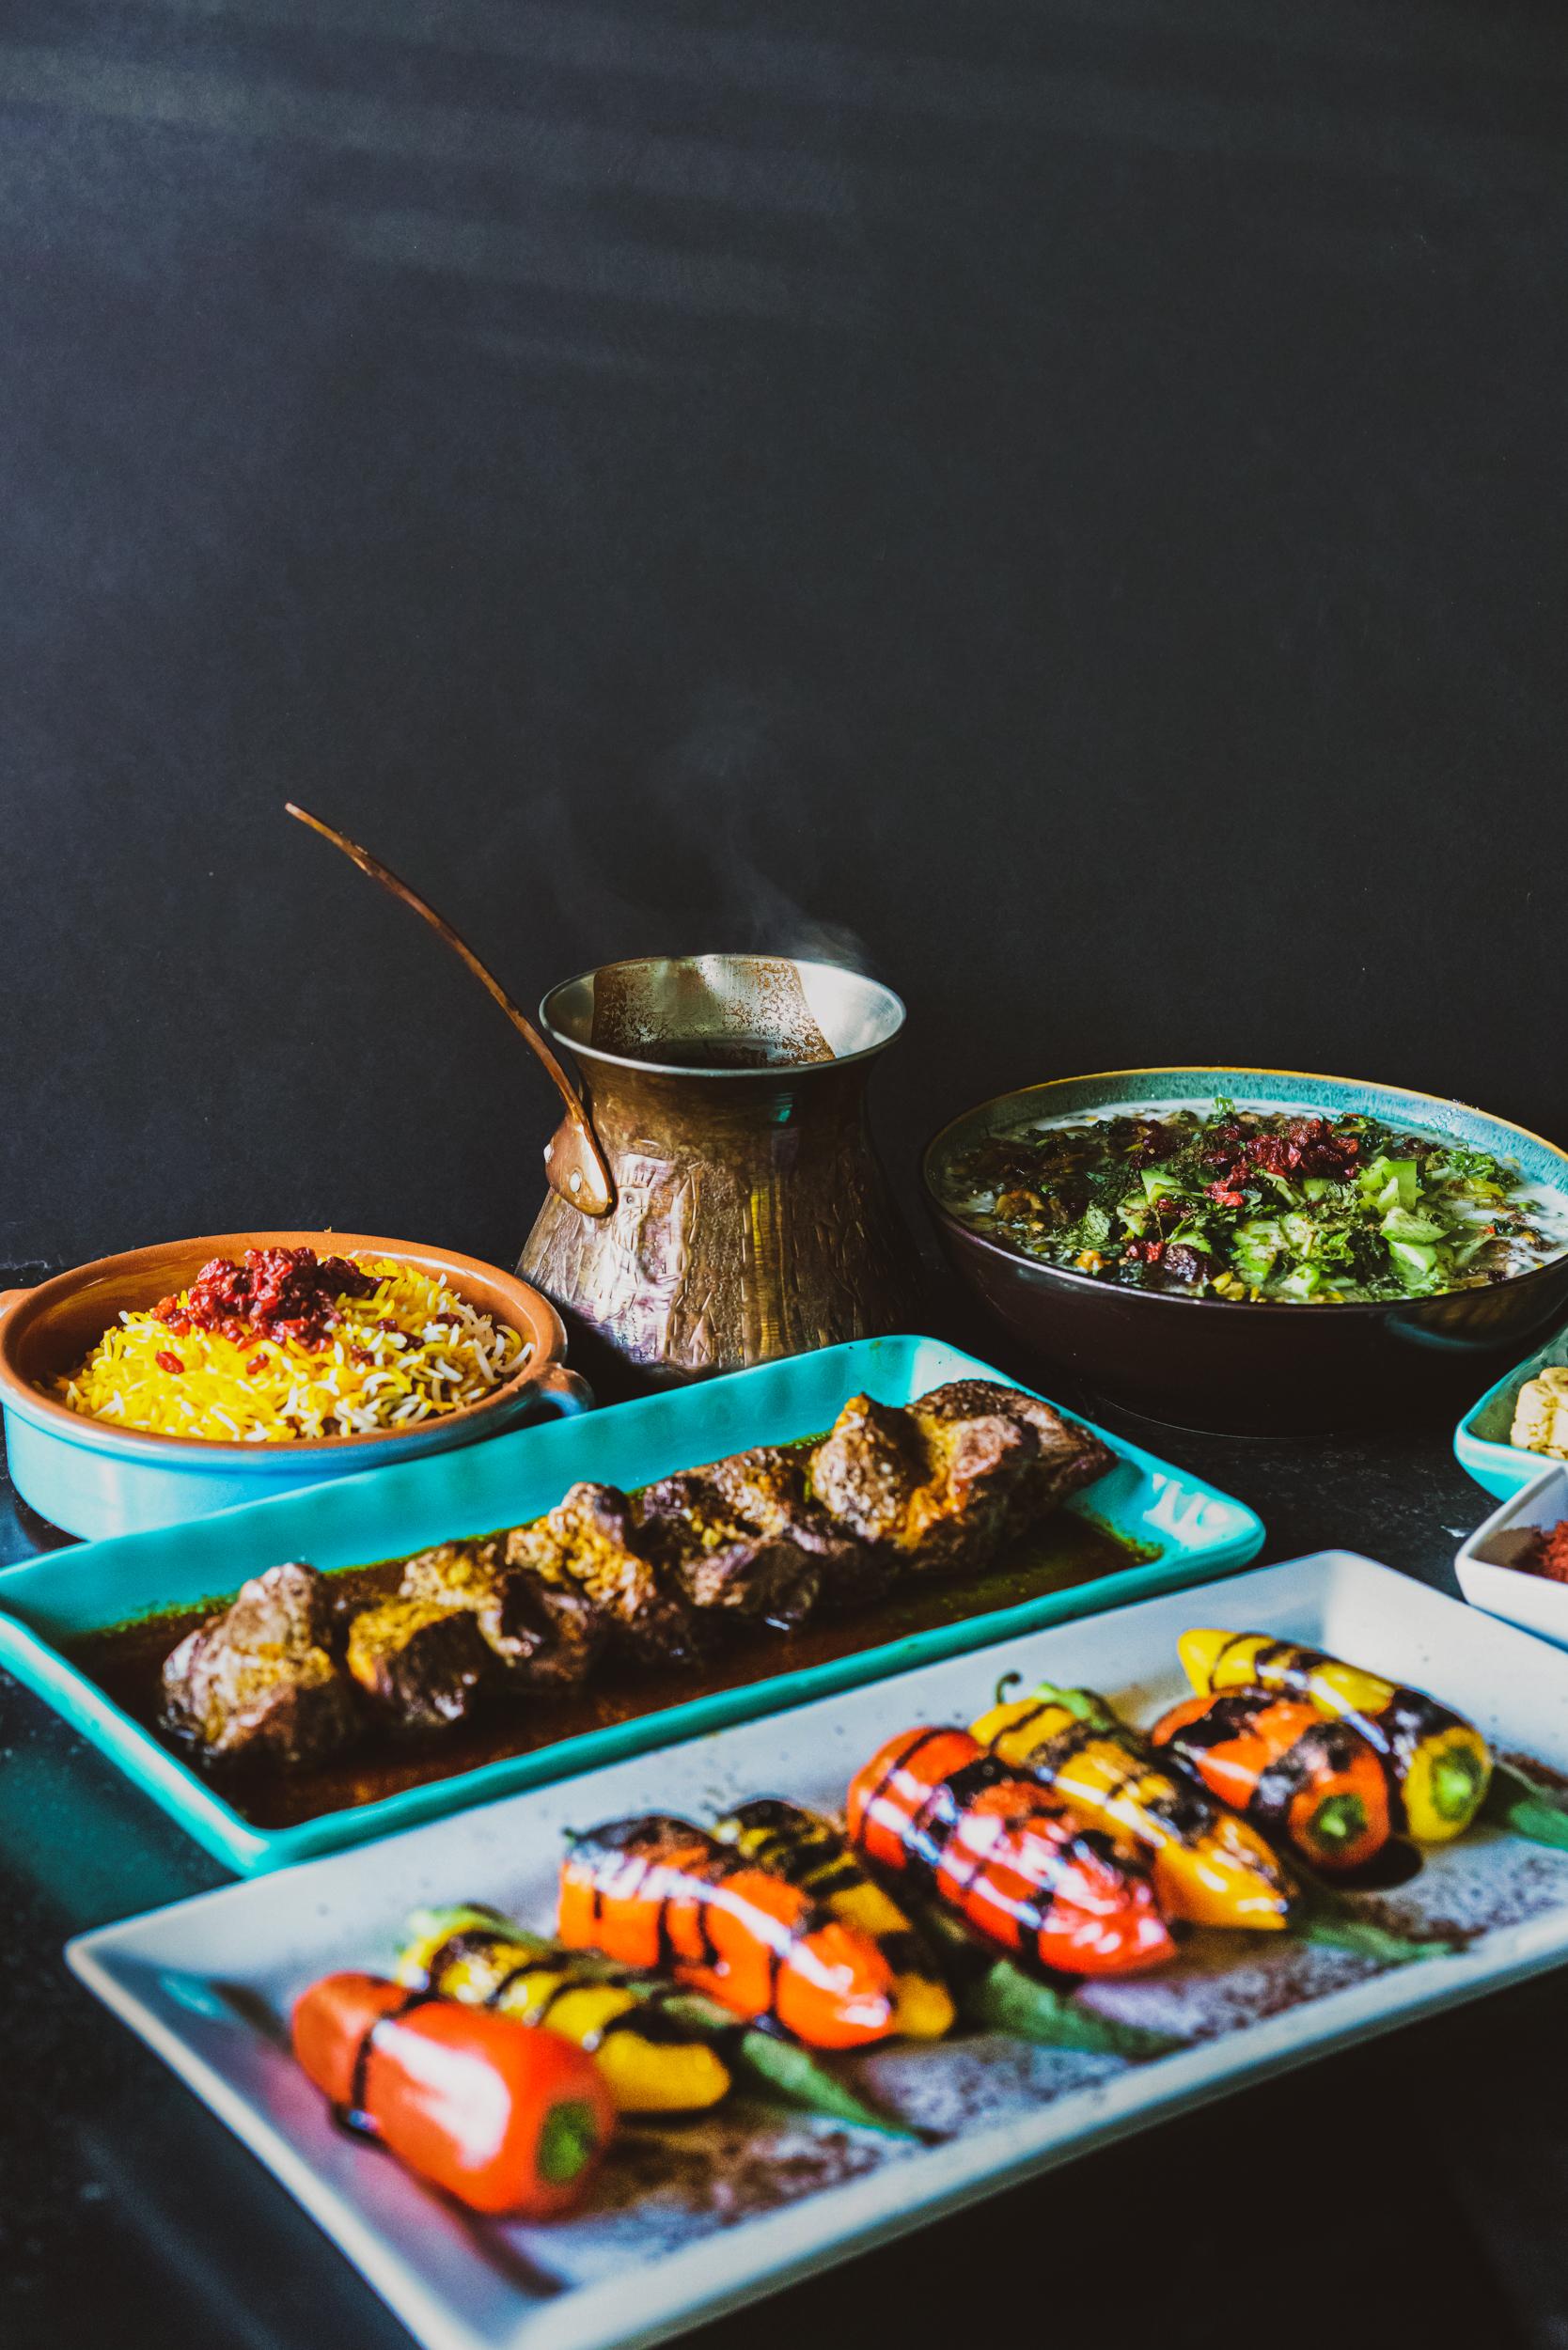 Persian & Mediterranean Inspired Food, Prepared Fresh Daily. - 10724 NE 68th St. Kirkland, WA 98033425.827.2424Weekdays11am–2:30pm5:00pm-8:30pmSaturdays12:00–8:30pmSundays12:00–6:00pmClosed on Mondays